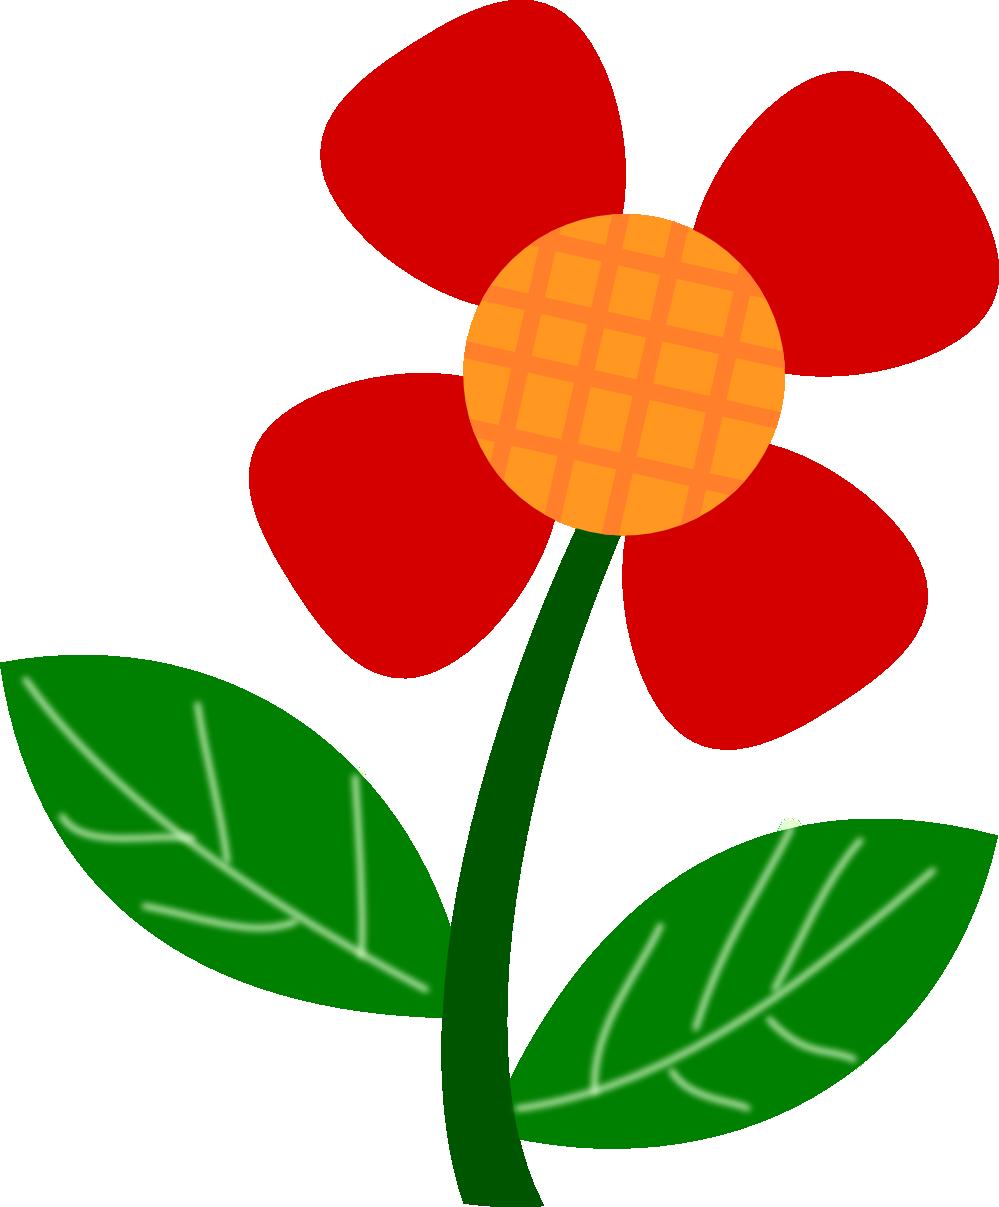 Flowers Clipart-flowers clipart-9